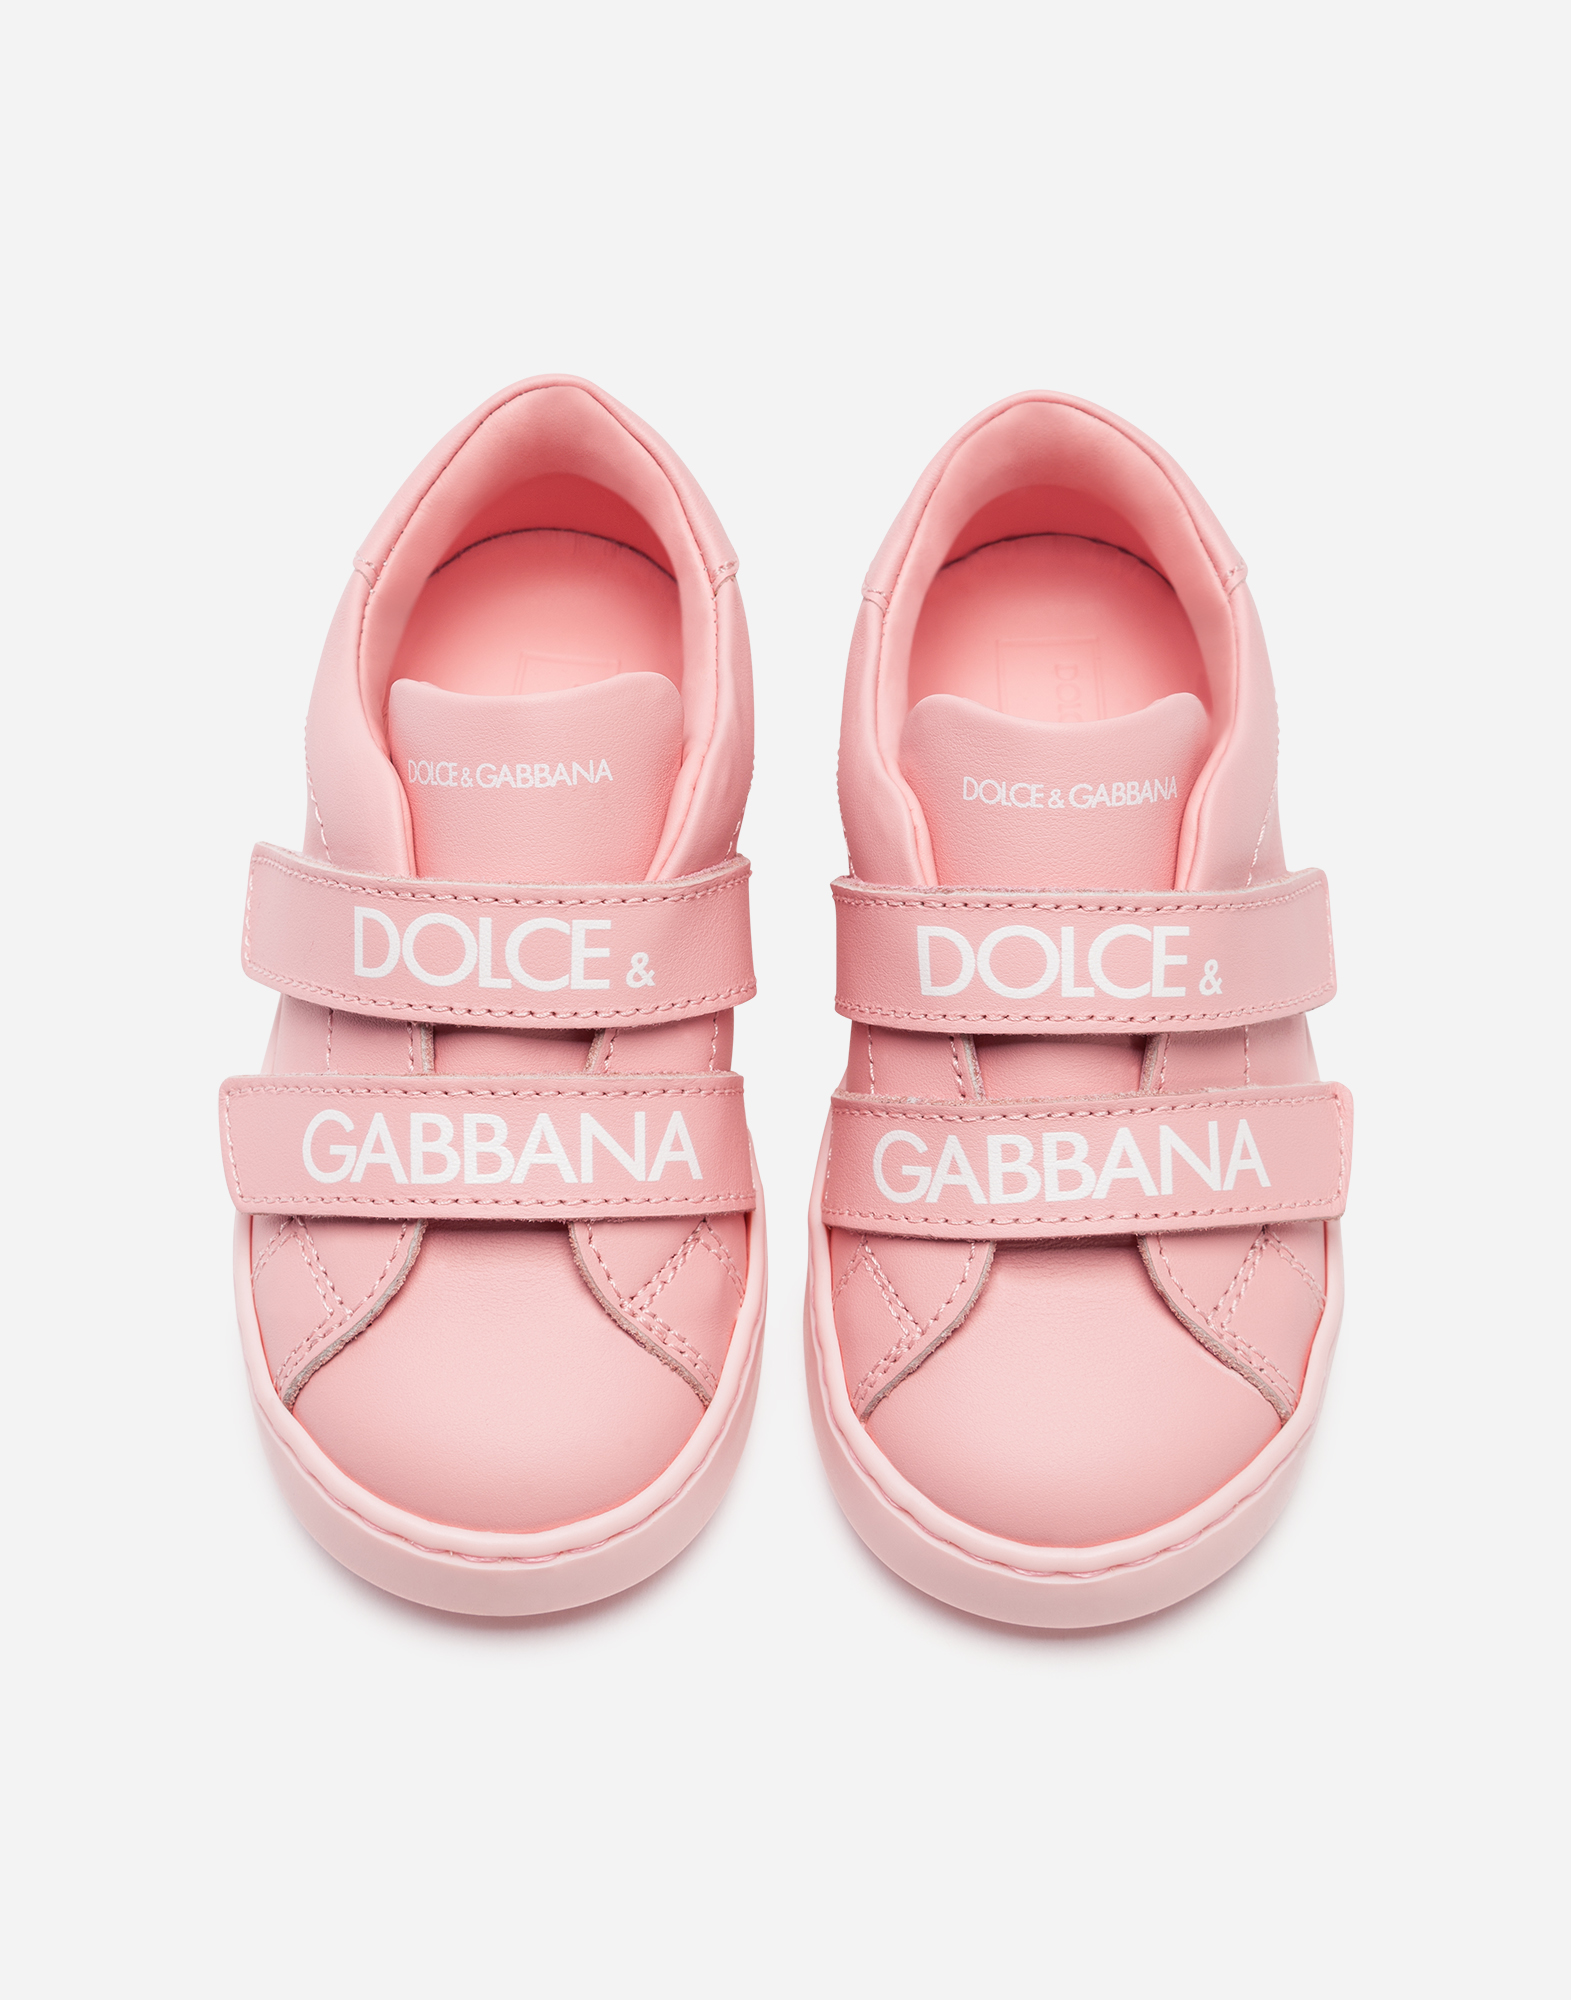 Dolce & Gabbana FIRST STEPS PORTOFINO SNEAKERS IN BRANDED NAPPA LEATHER